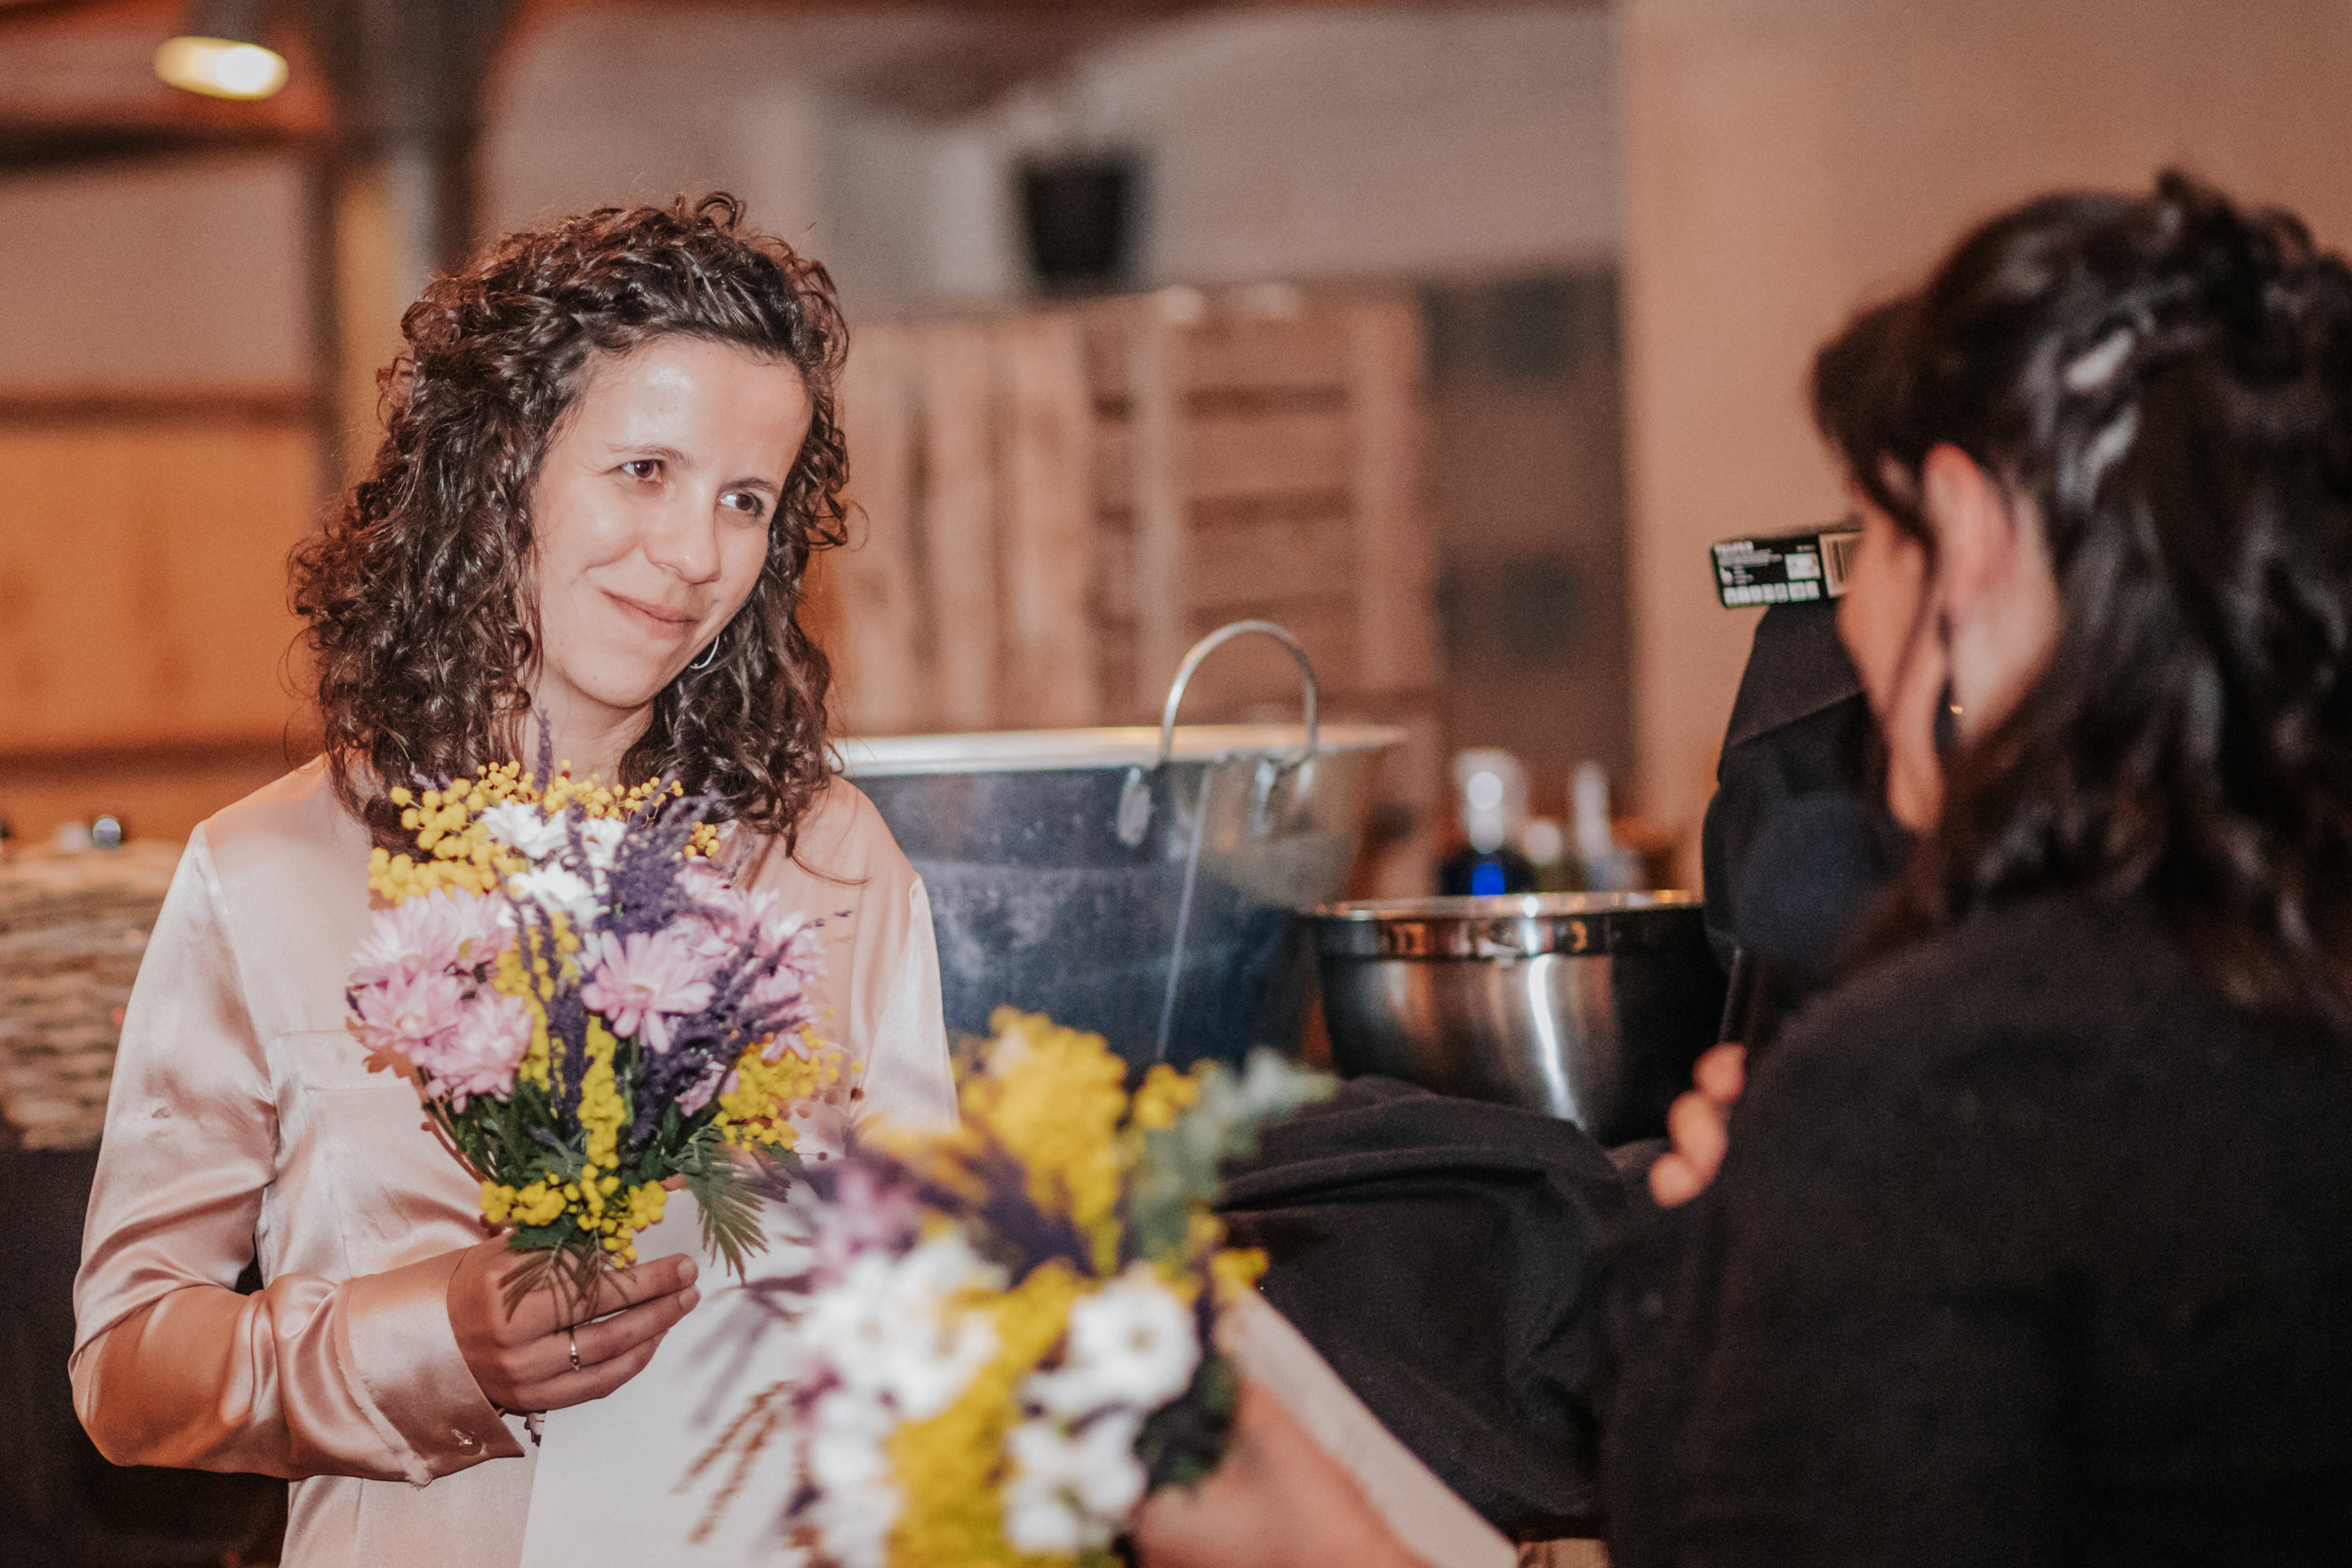 Fotógrafo de bodas :: Boda gay :: boda industrial :: boda lesbiana :: Boda LGTB :: Nómades :: Boda diferente :: Boda original :: Boda Manresa :: La Manufactura